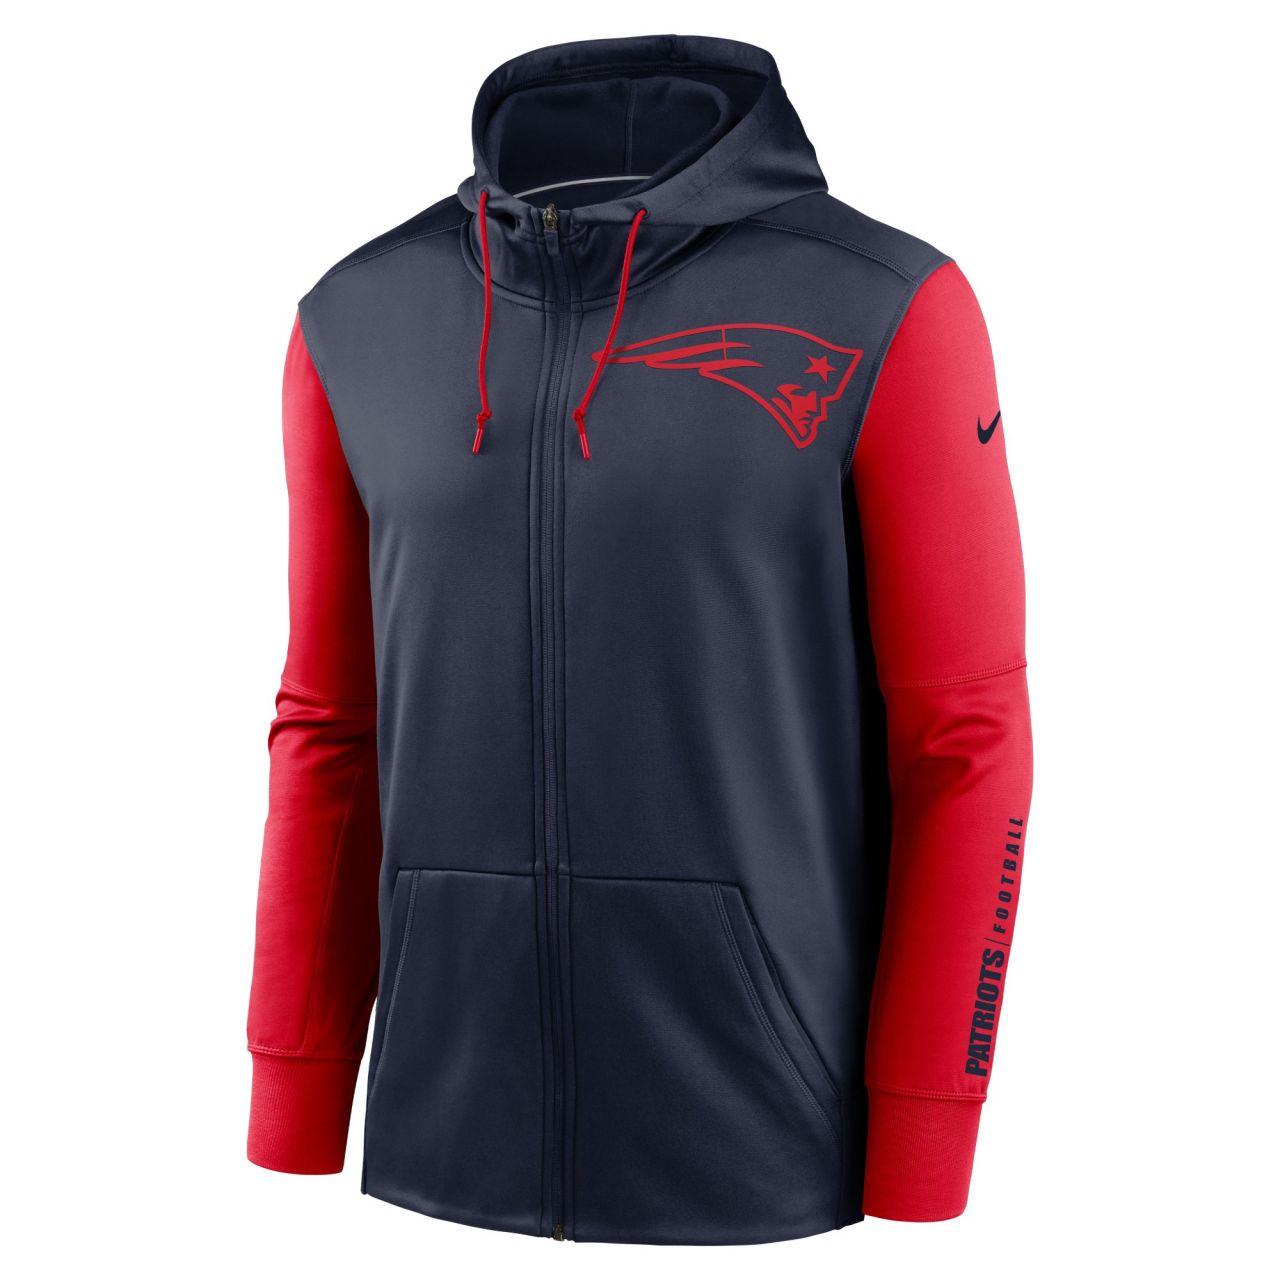 amfoo - Nike NFL Therma Zip Hoody - New England Patriots